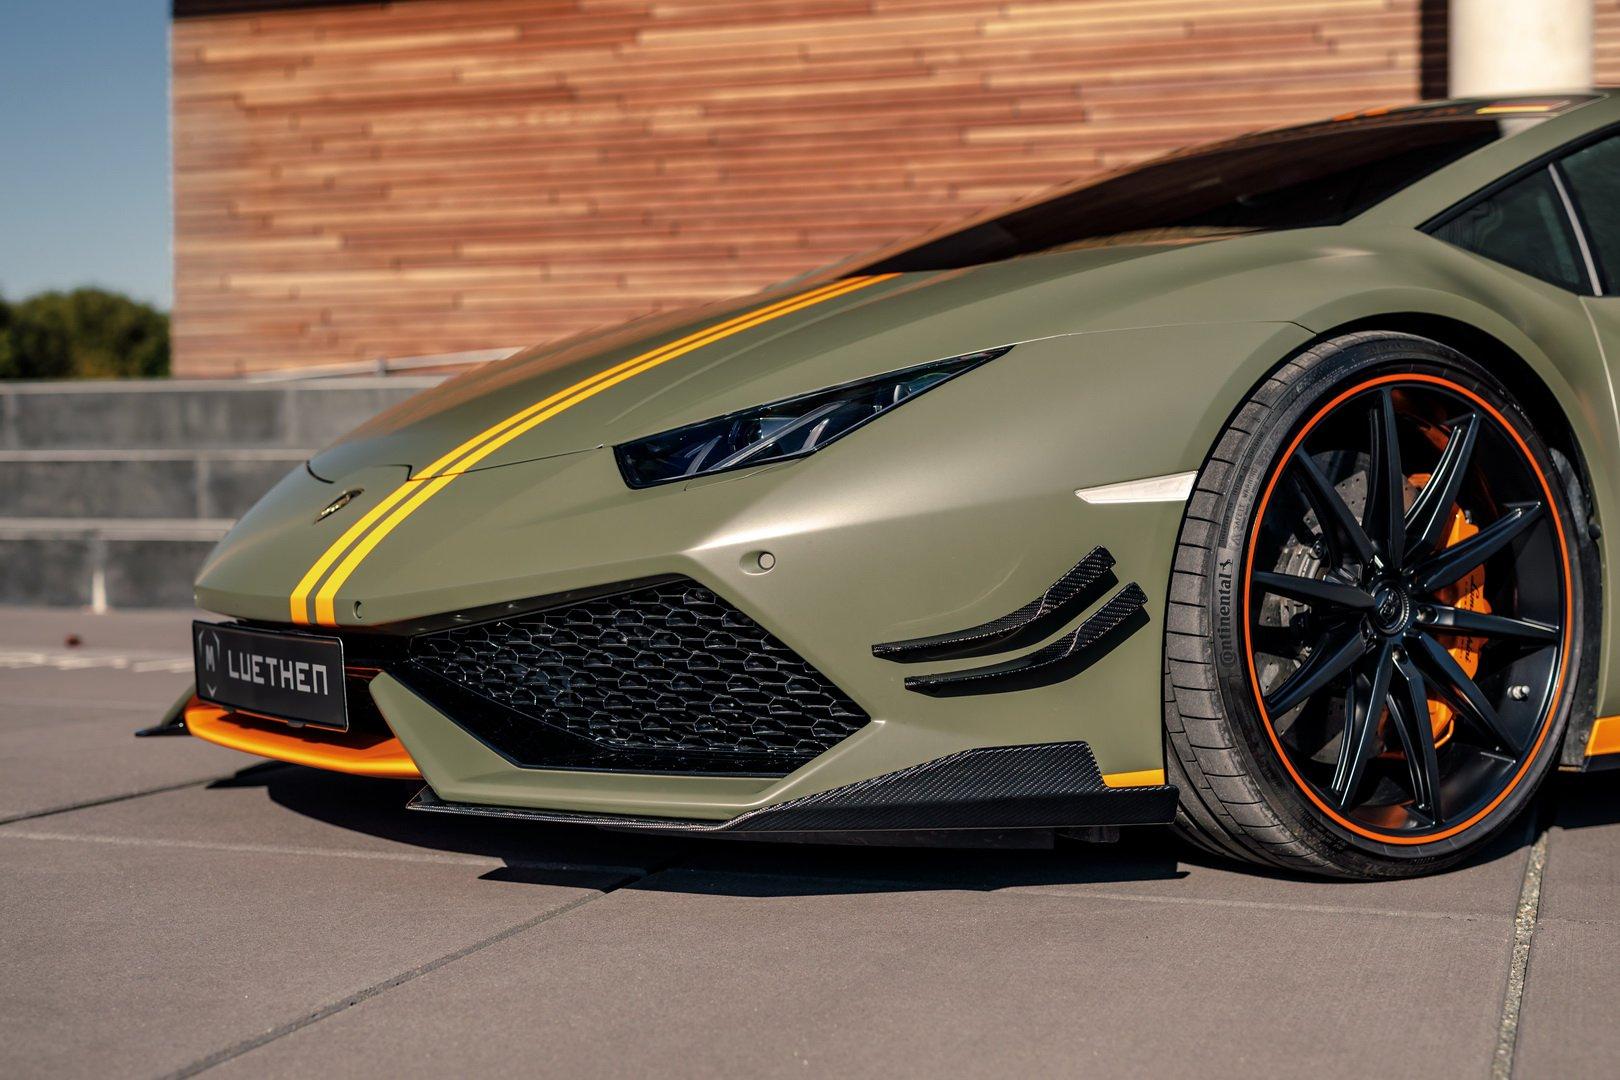 Lamborghini Huracan Avio by Luethen Motorsport (1)